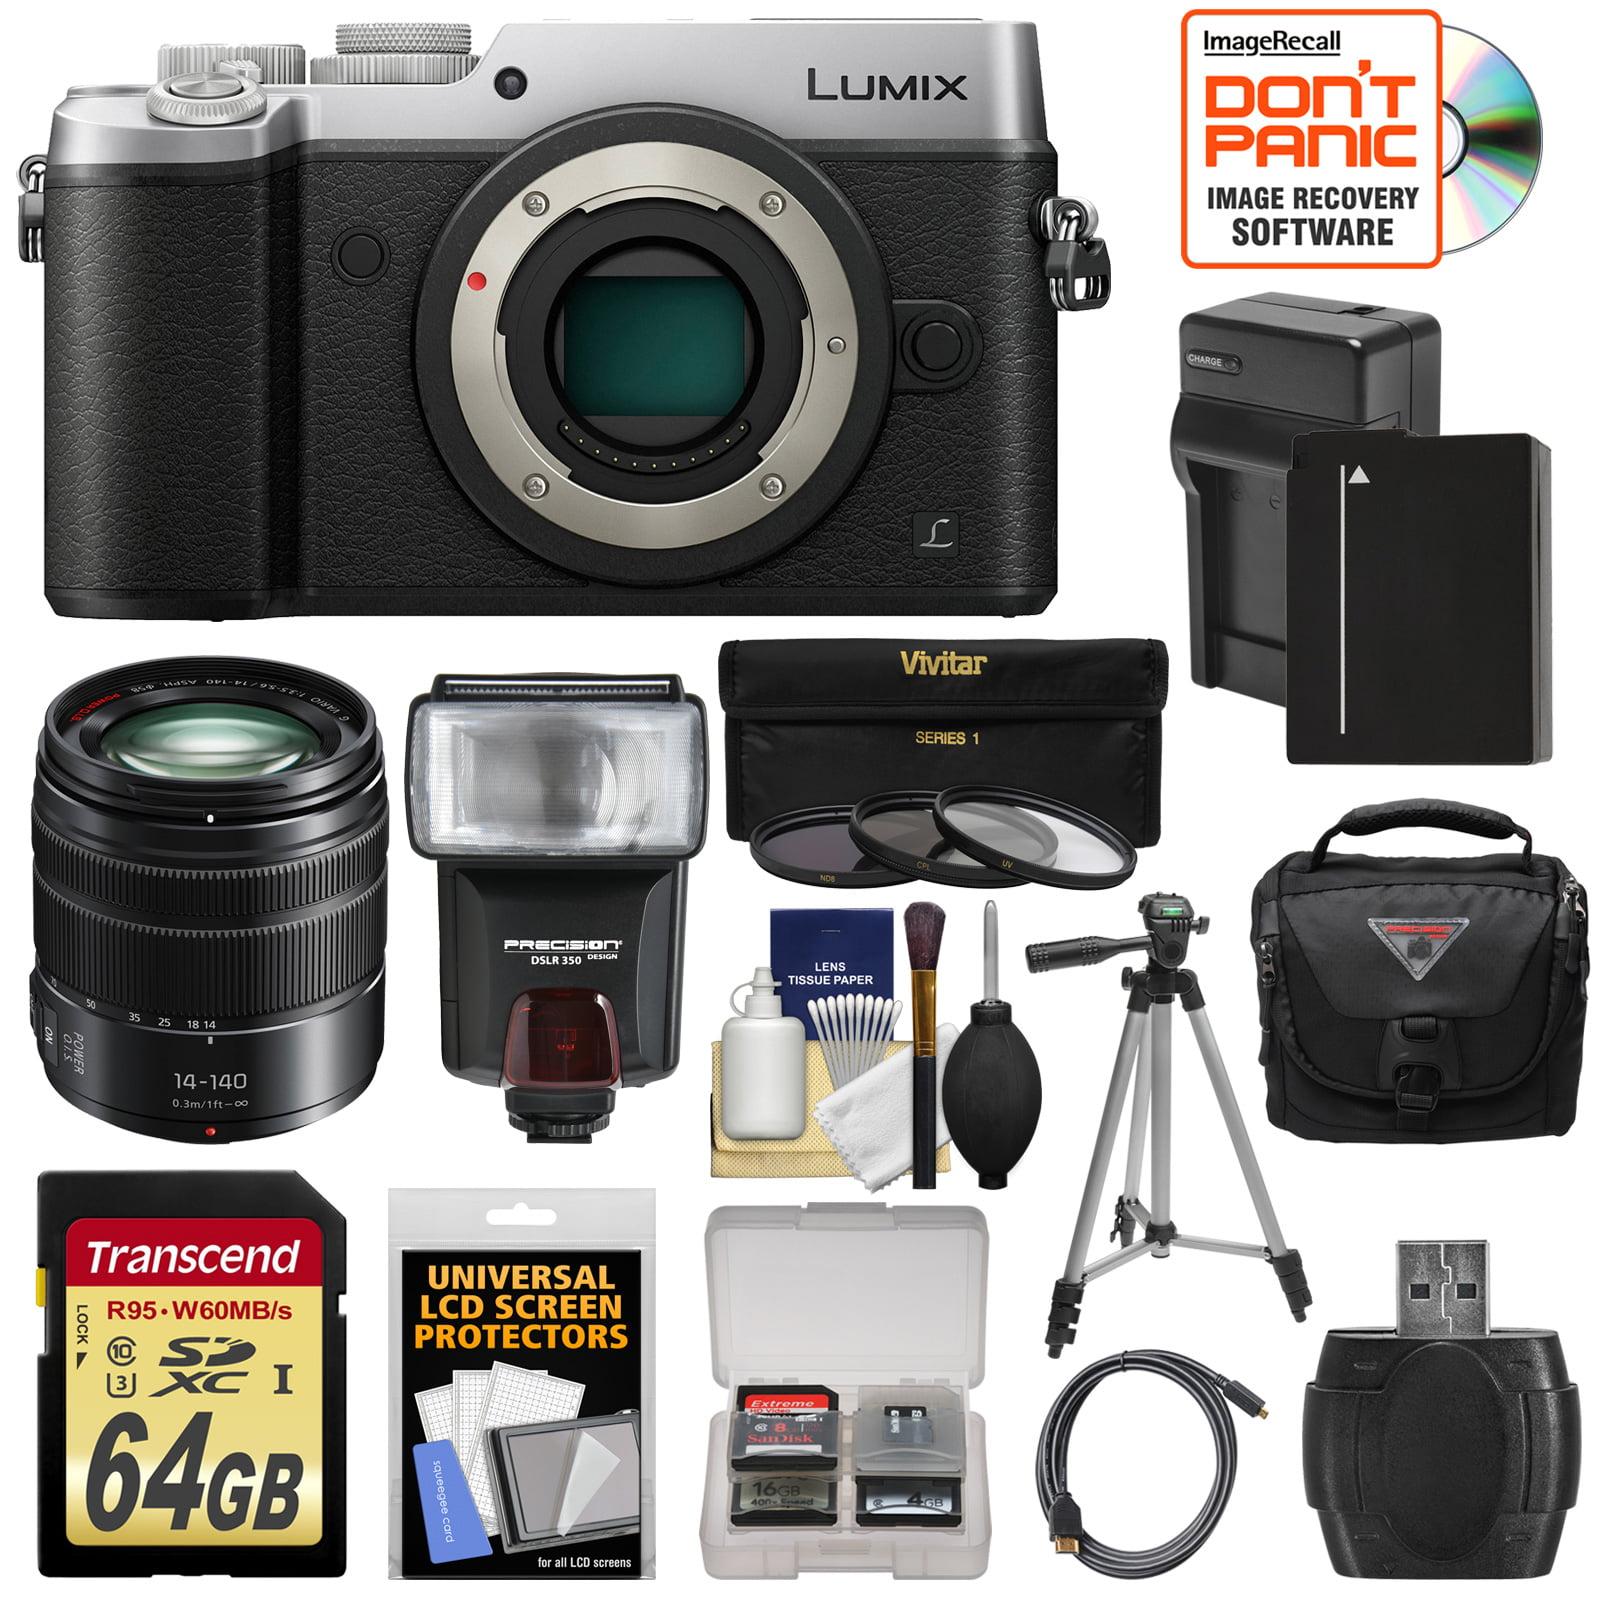 Panasonic Lumix DMC-GX8 4K Wi-Fi Digital Camera Body (Silver) with 14-140mm Power OIS Lens + 64GB Card +... by Panasonic